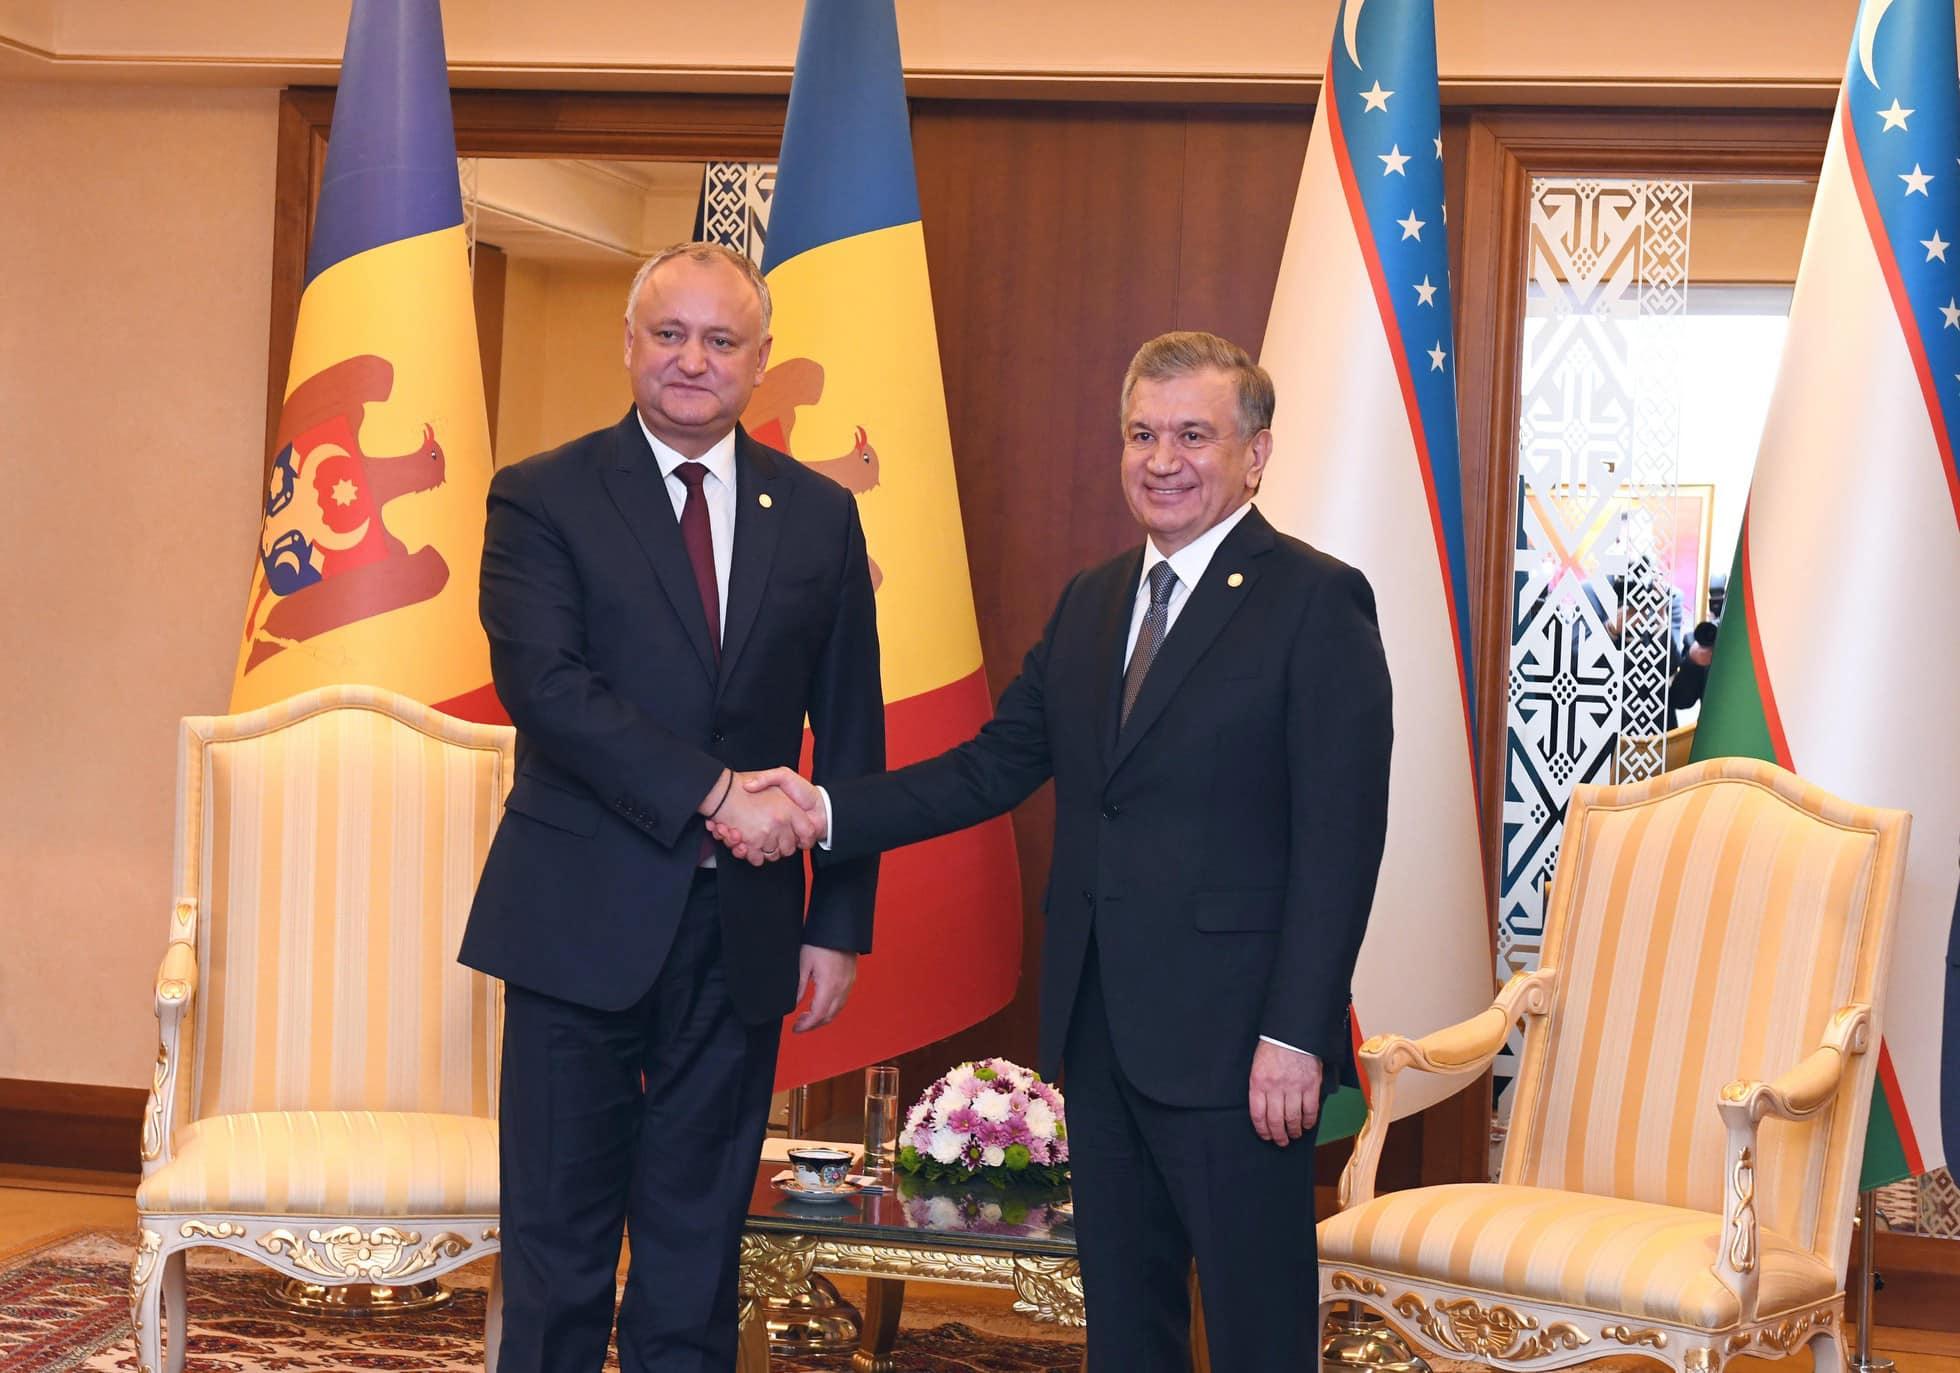 Глава государства провел встречу и с президентом Узбекистана (ФОТО, ВИДЕО)